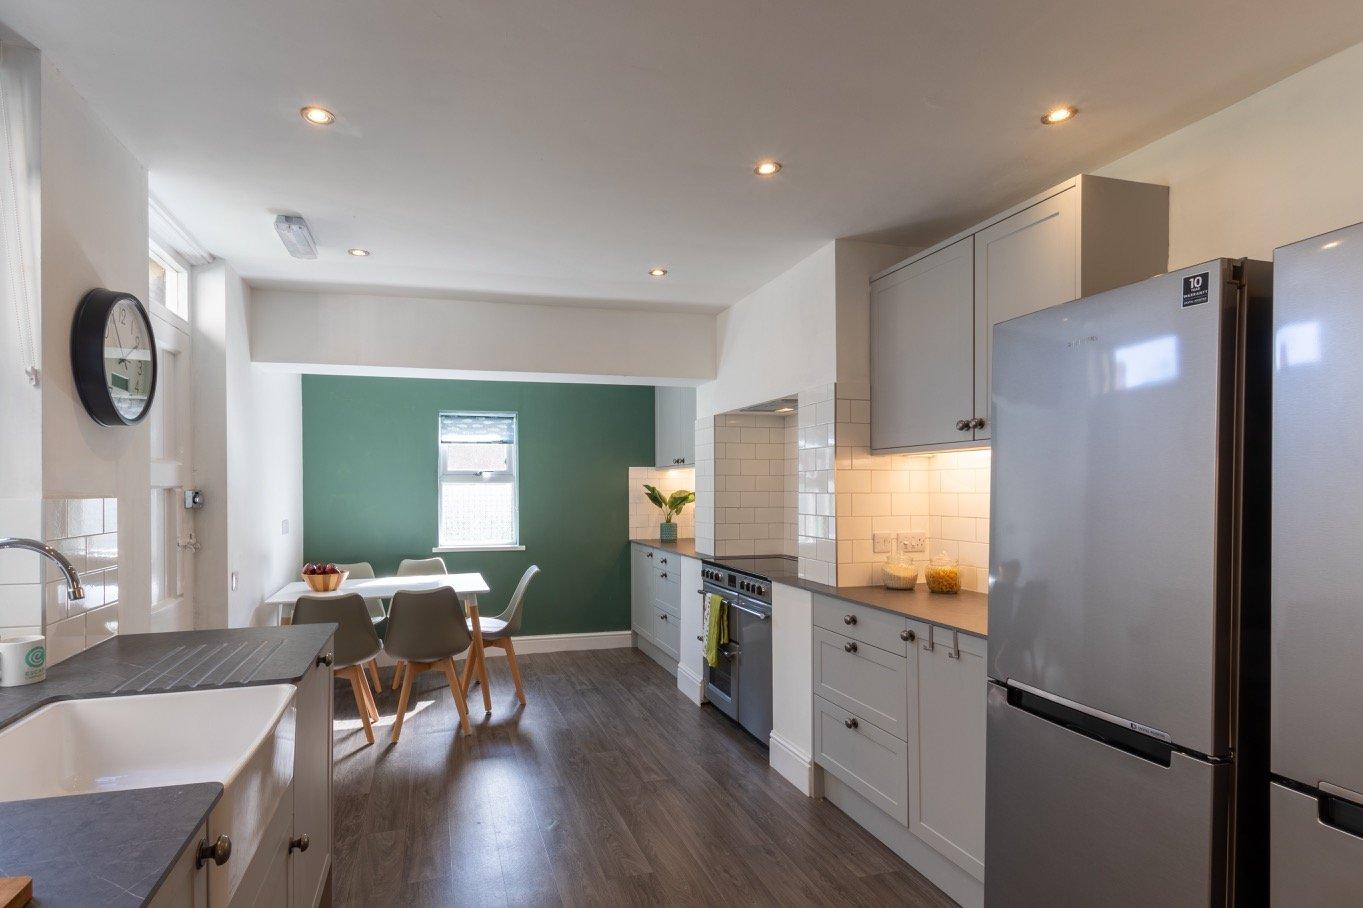 23 Westbourne Road Lancaster University of Cumbria Student Accommodation